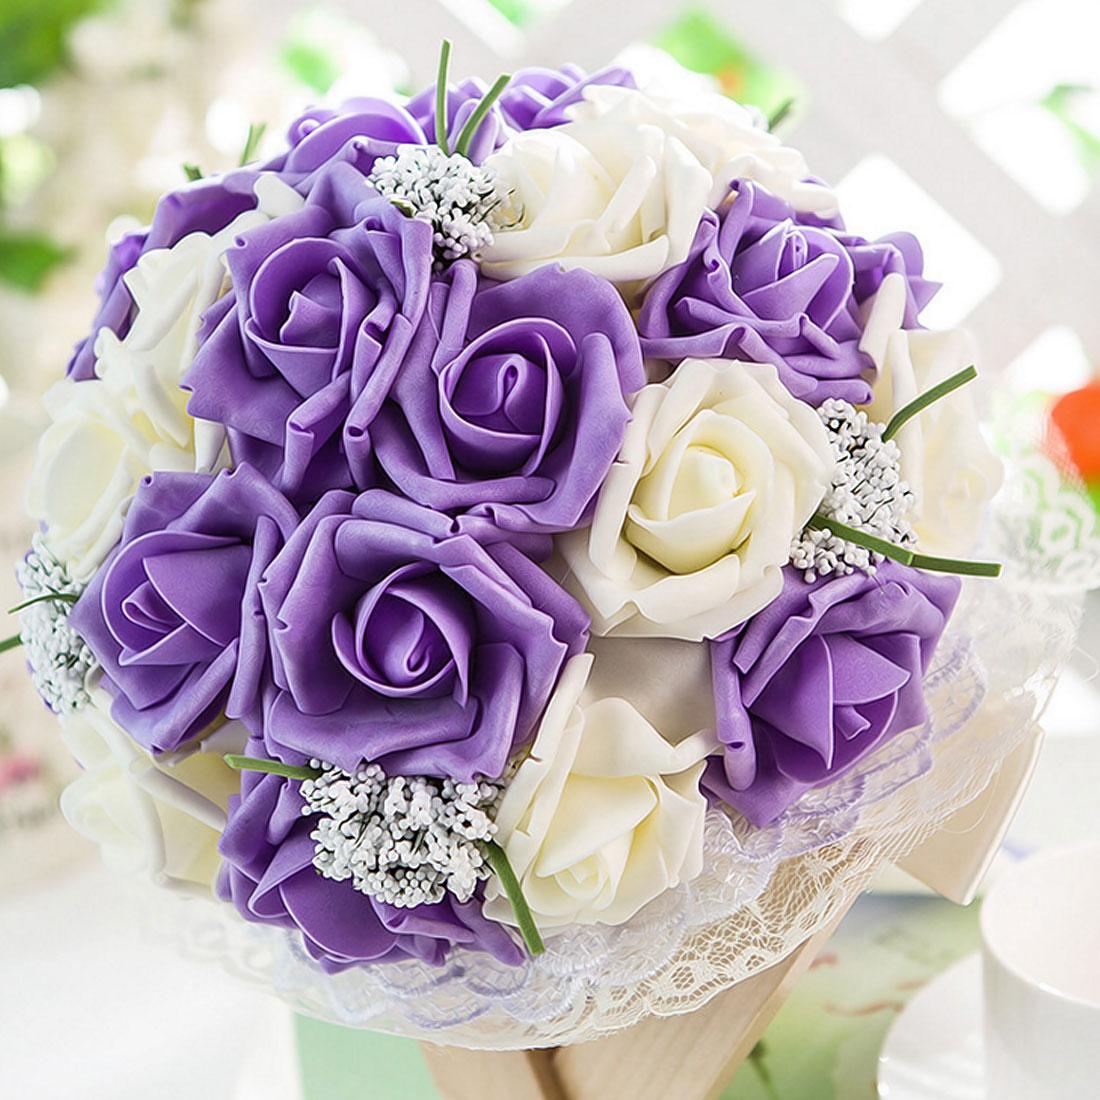 10 Heads 5 Heads 8CM Artificial PE Foam Rose Flowers Bride Bouquet Home Wedding flower Fake Flowers home decoration accessories